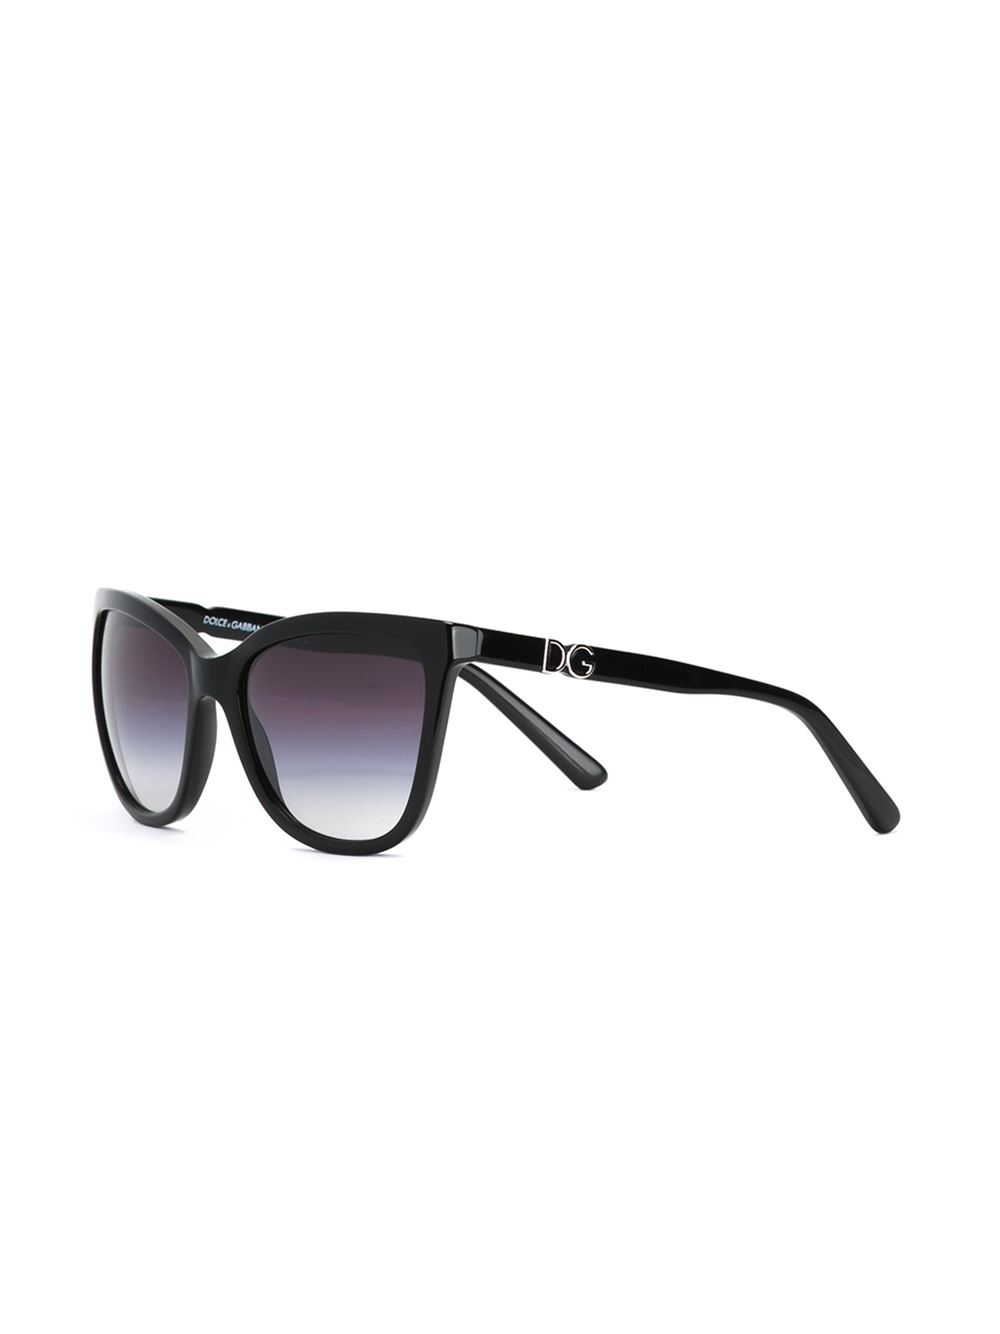 Dolce & gabbana Cat Eye Frame Sunglasses in Black Lyst